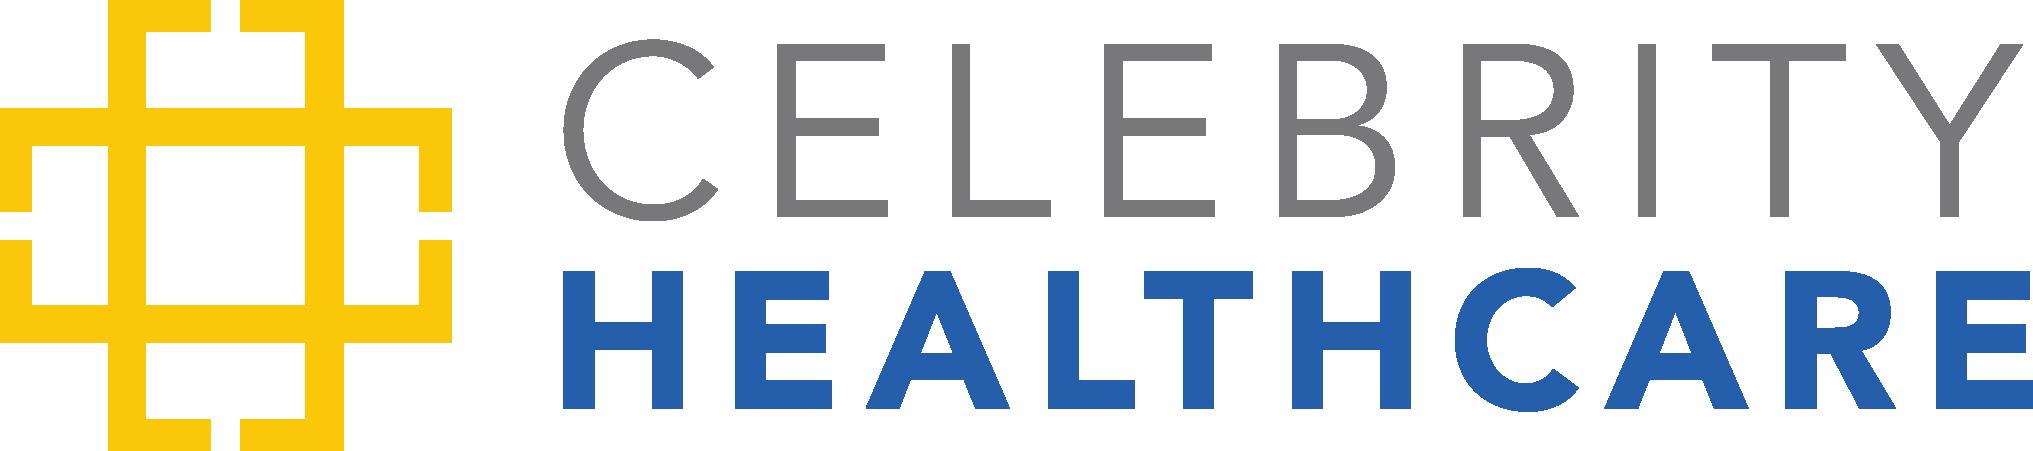 Celebrity Healthcare Logo - Alternate